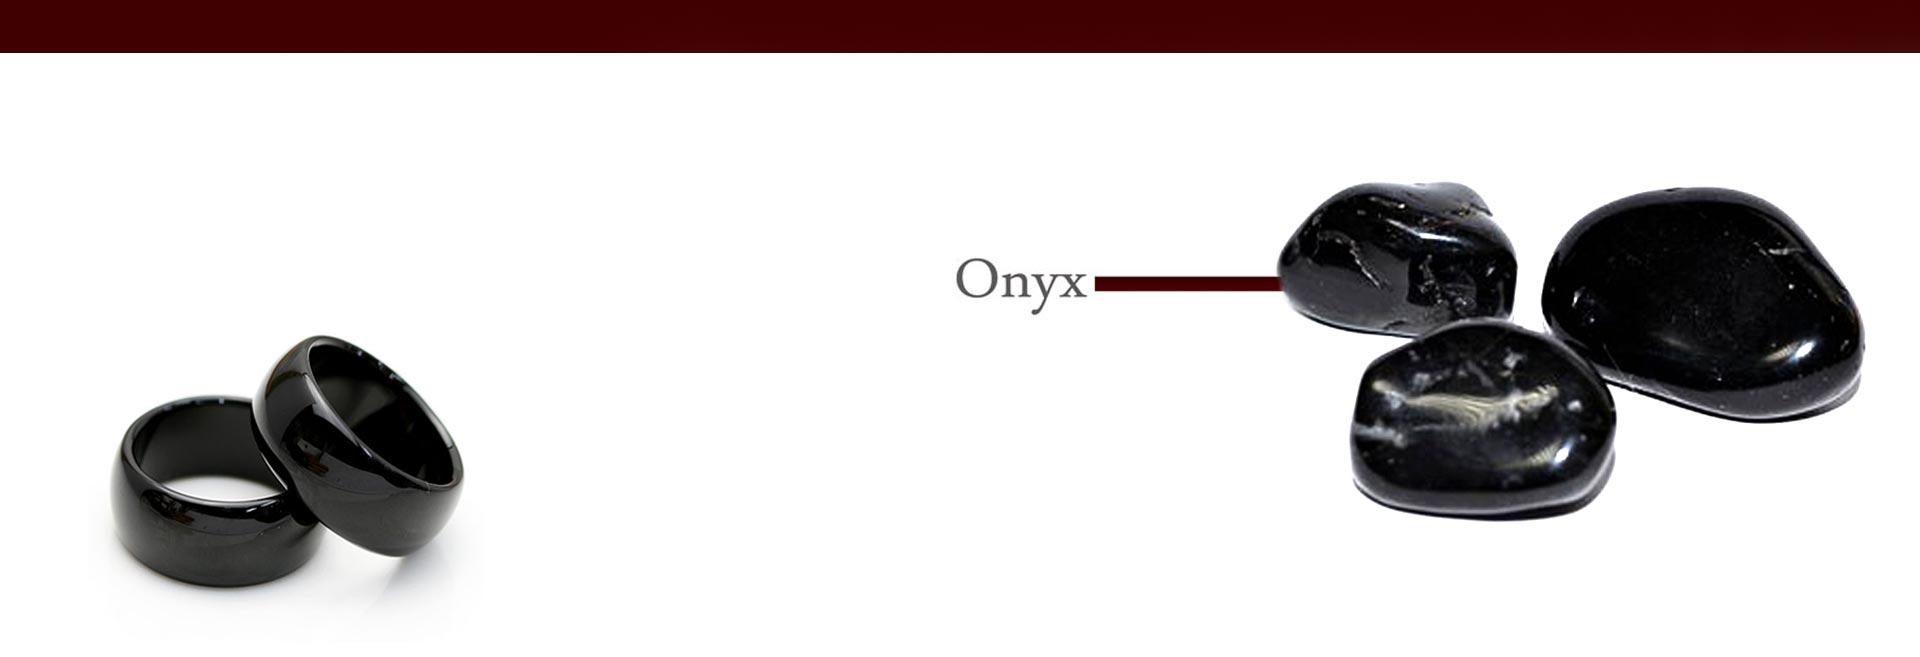 بررسی سنگ قیمتی اونیکس